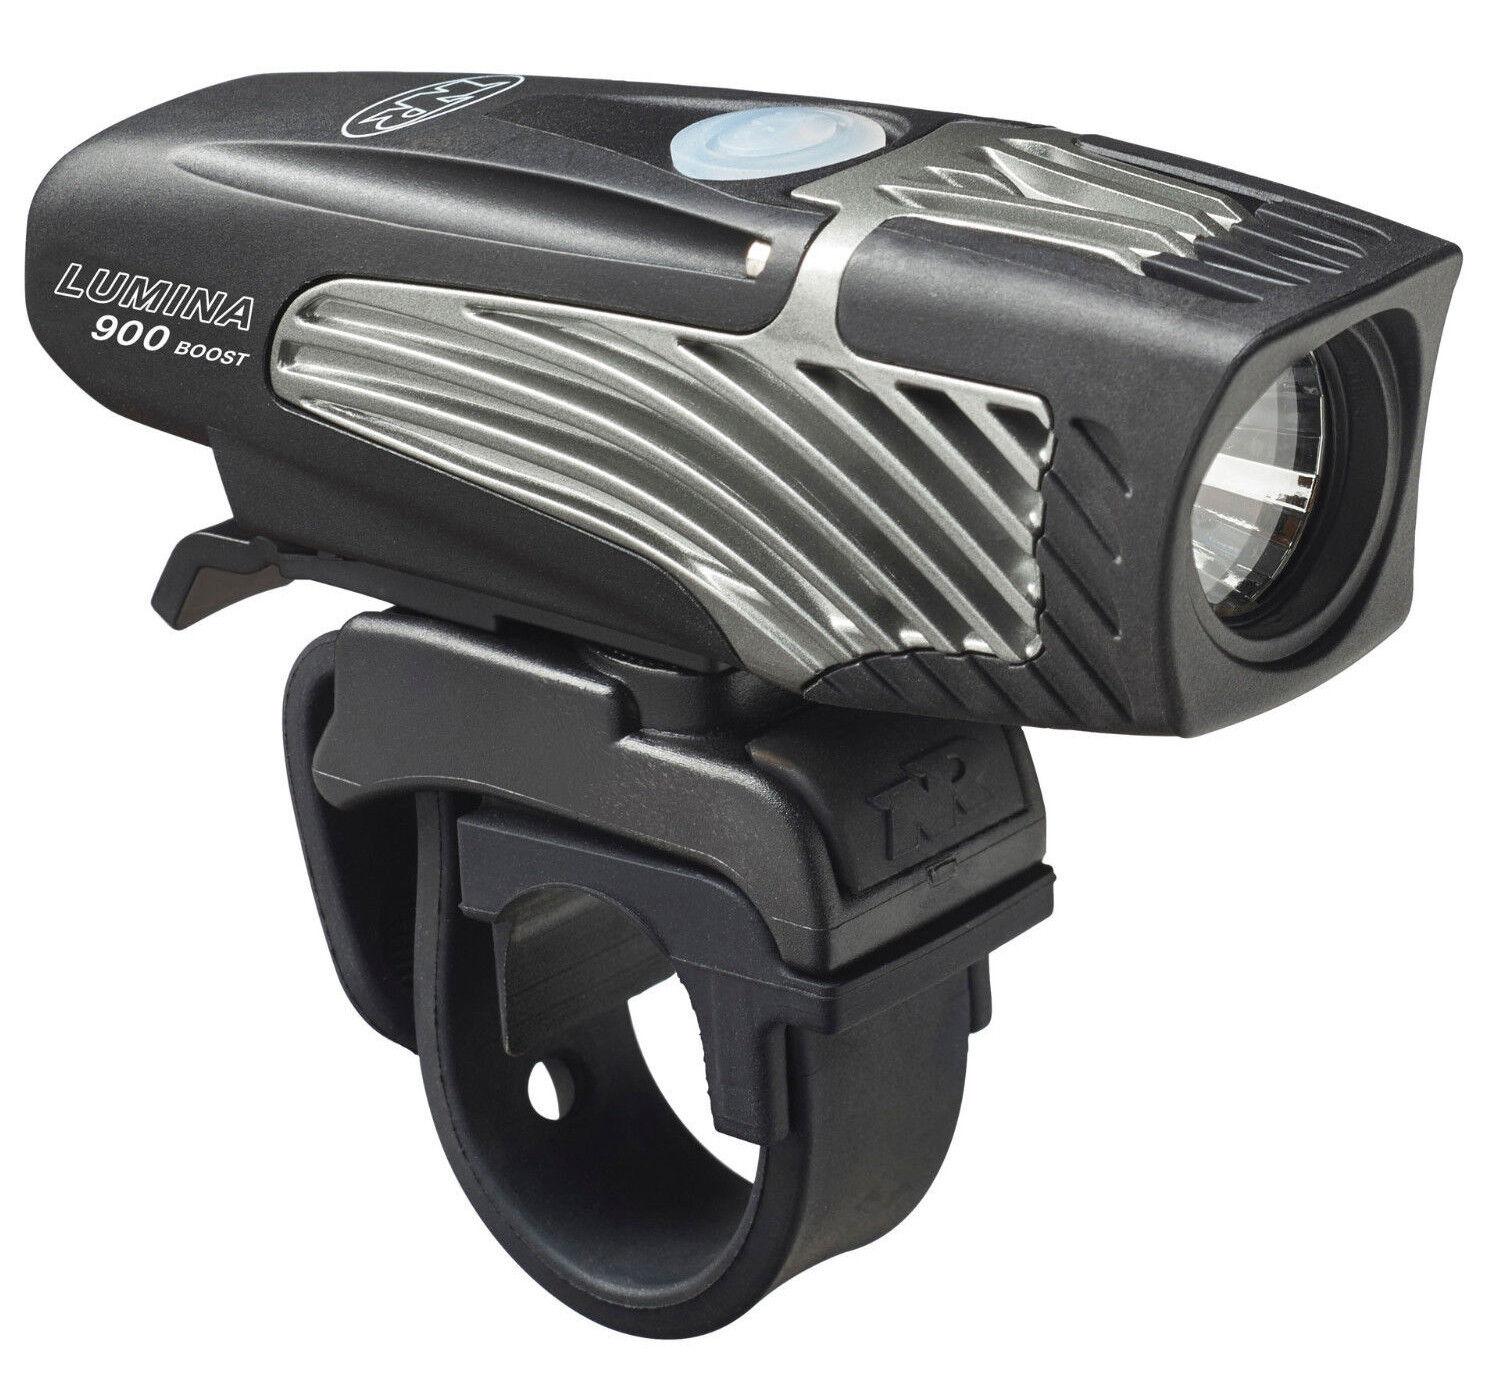 NiteRider Lumina 900 Boost Headlight Bike Light Lumen USB Rechargeable